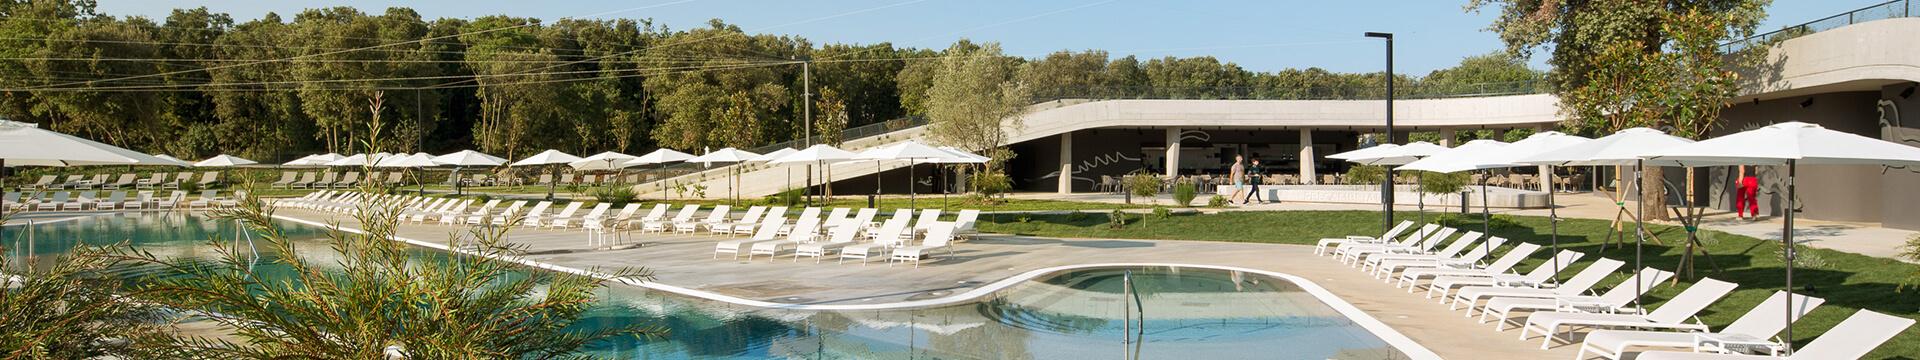 Kamp Mon Perin bogatiji za novi tematski vodeni park i 20 novih mobilnih kućica